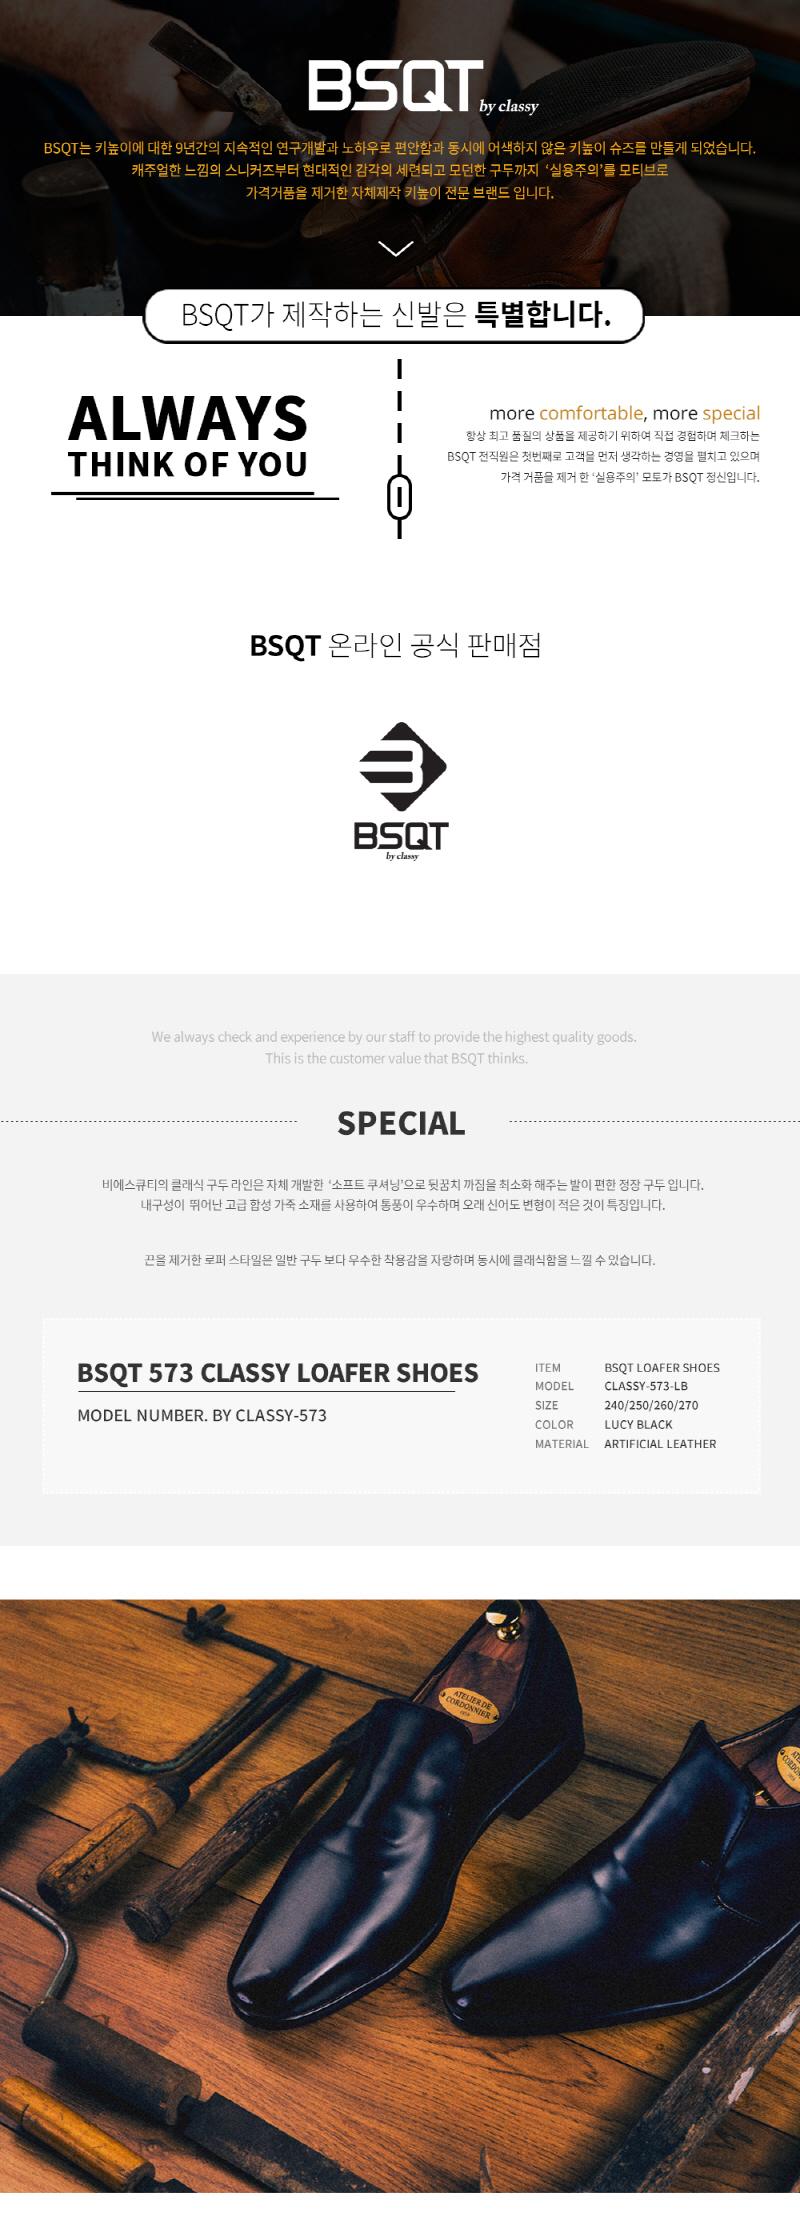 [BSQT] 573 클래식 키높이 정장 로퍼 루시블랙